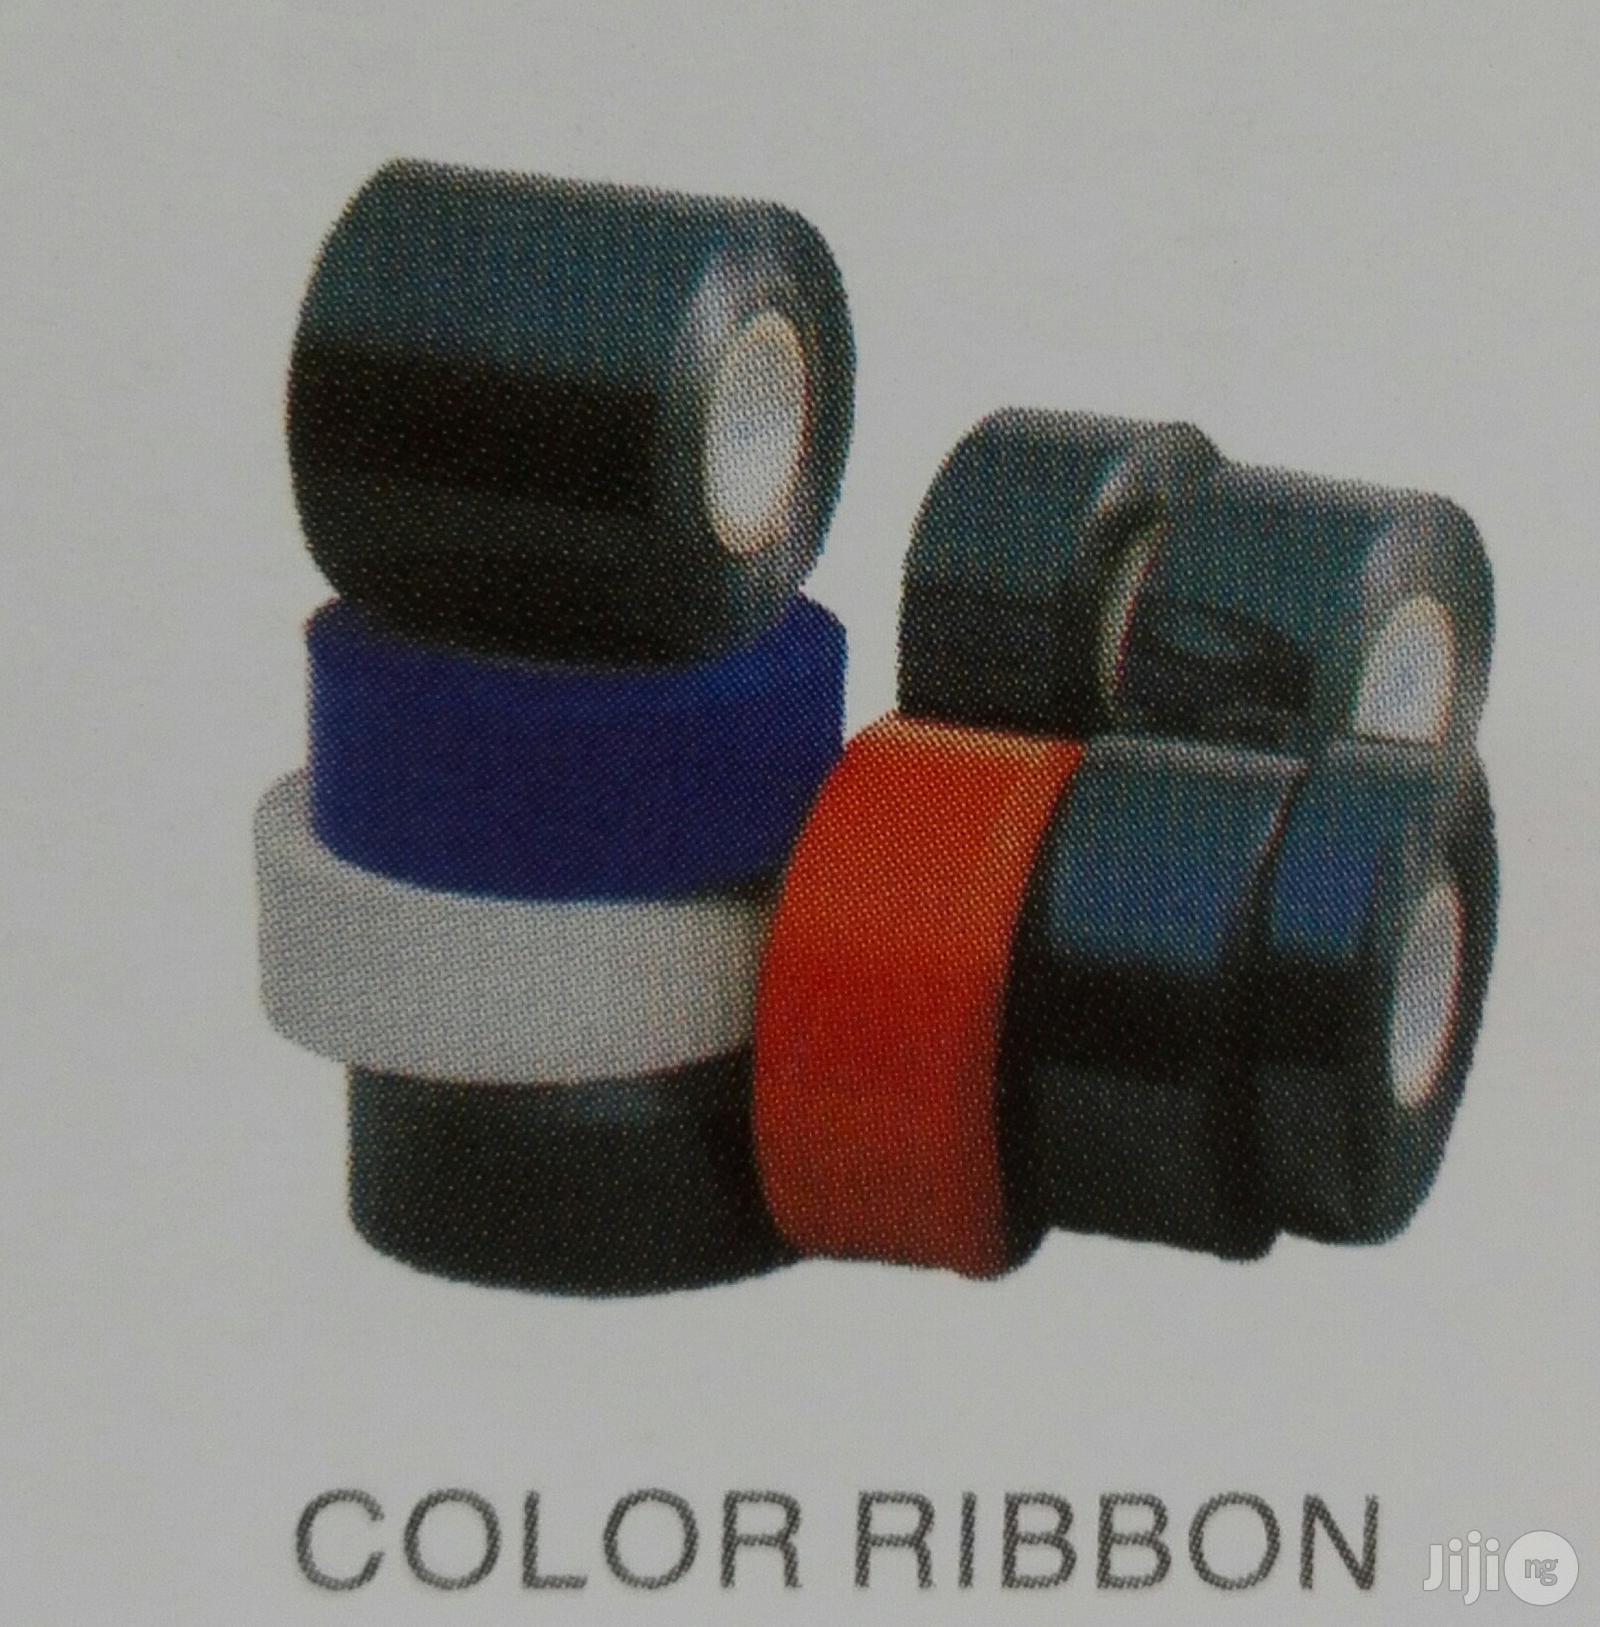 Colour Ribon